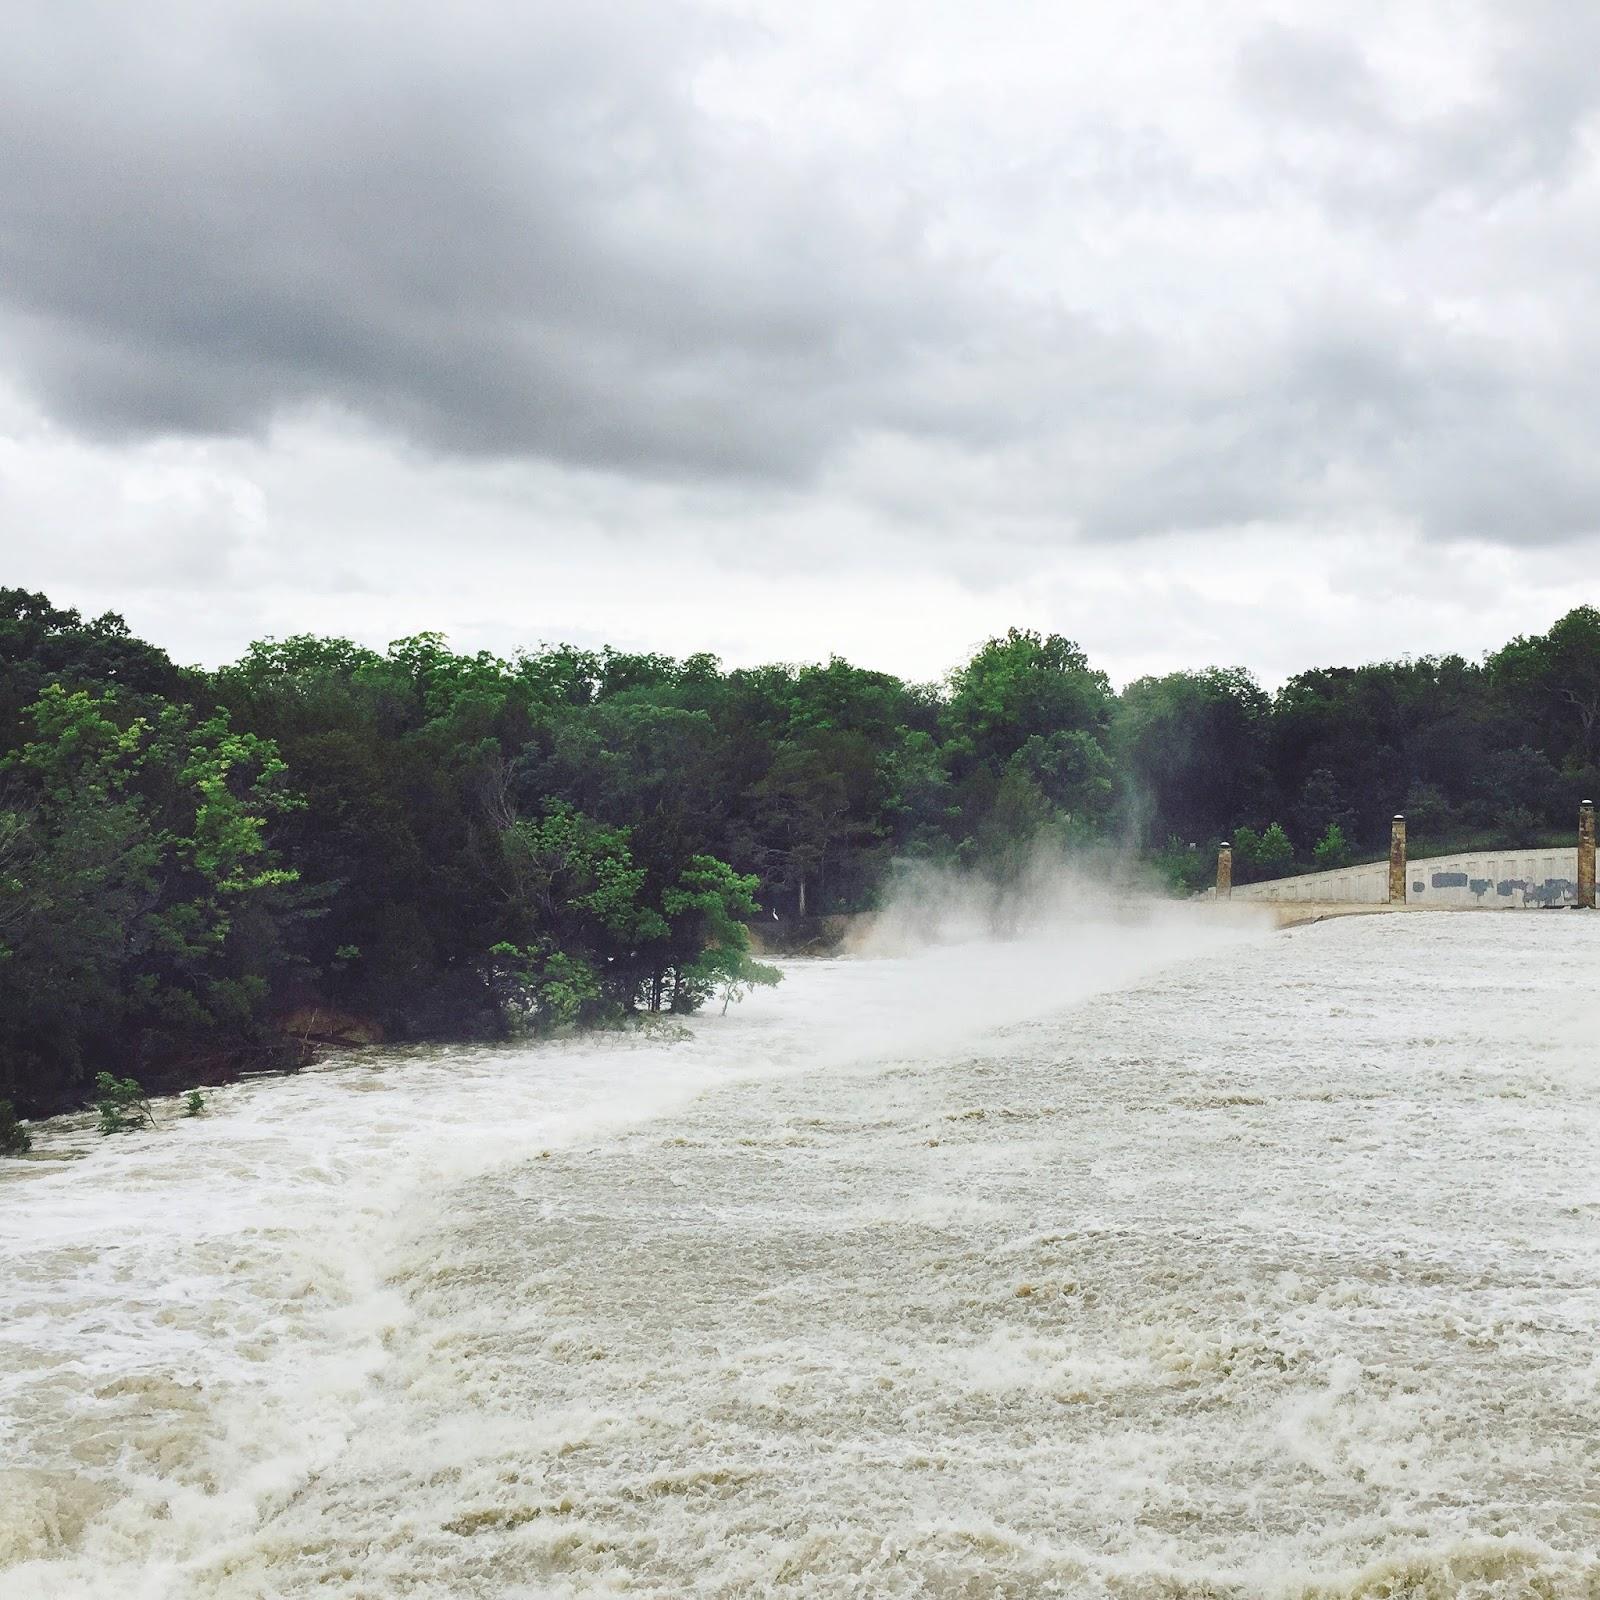 White rock lake spillway flooding